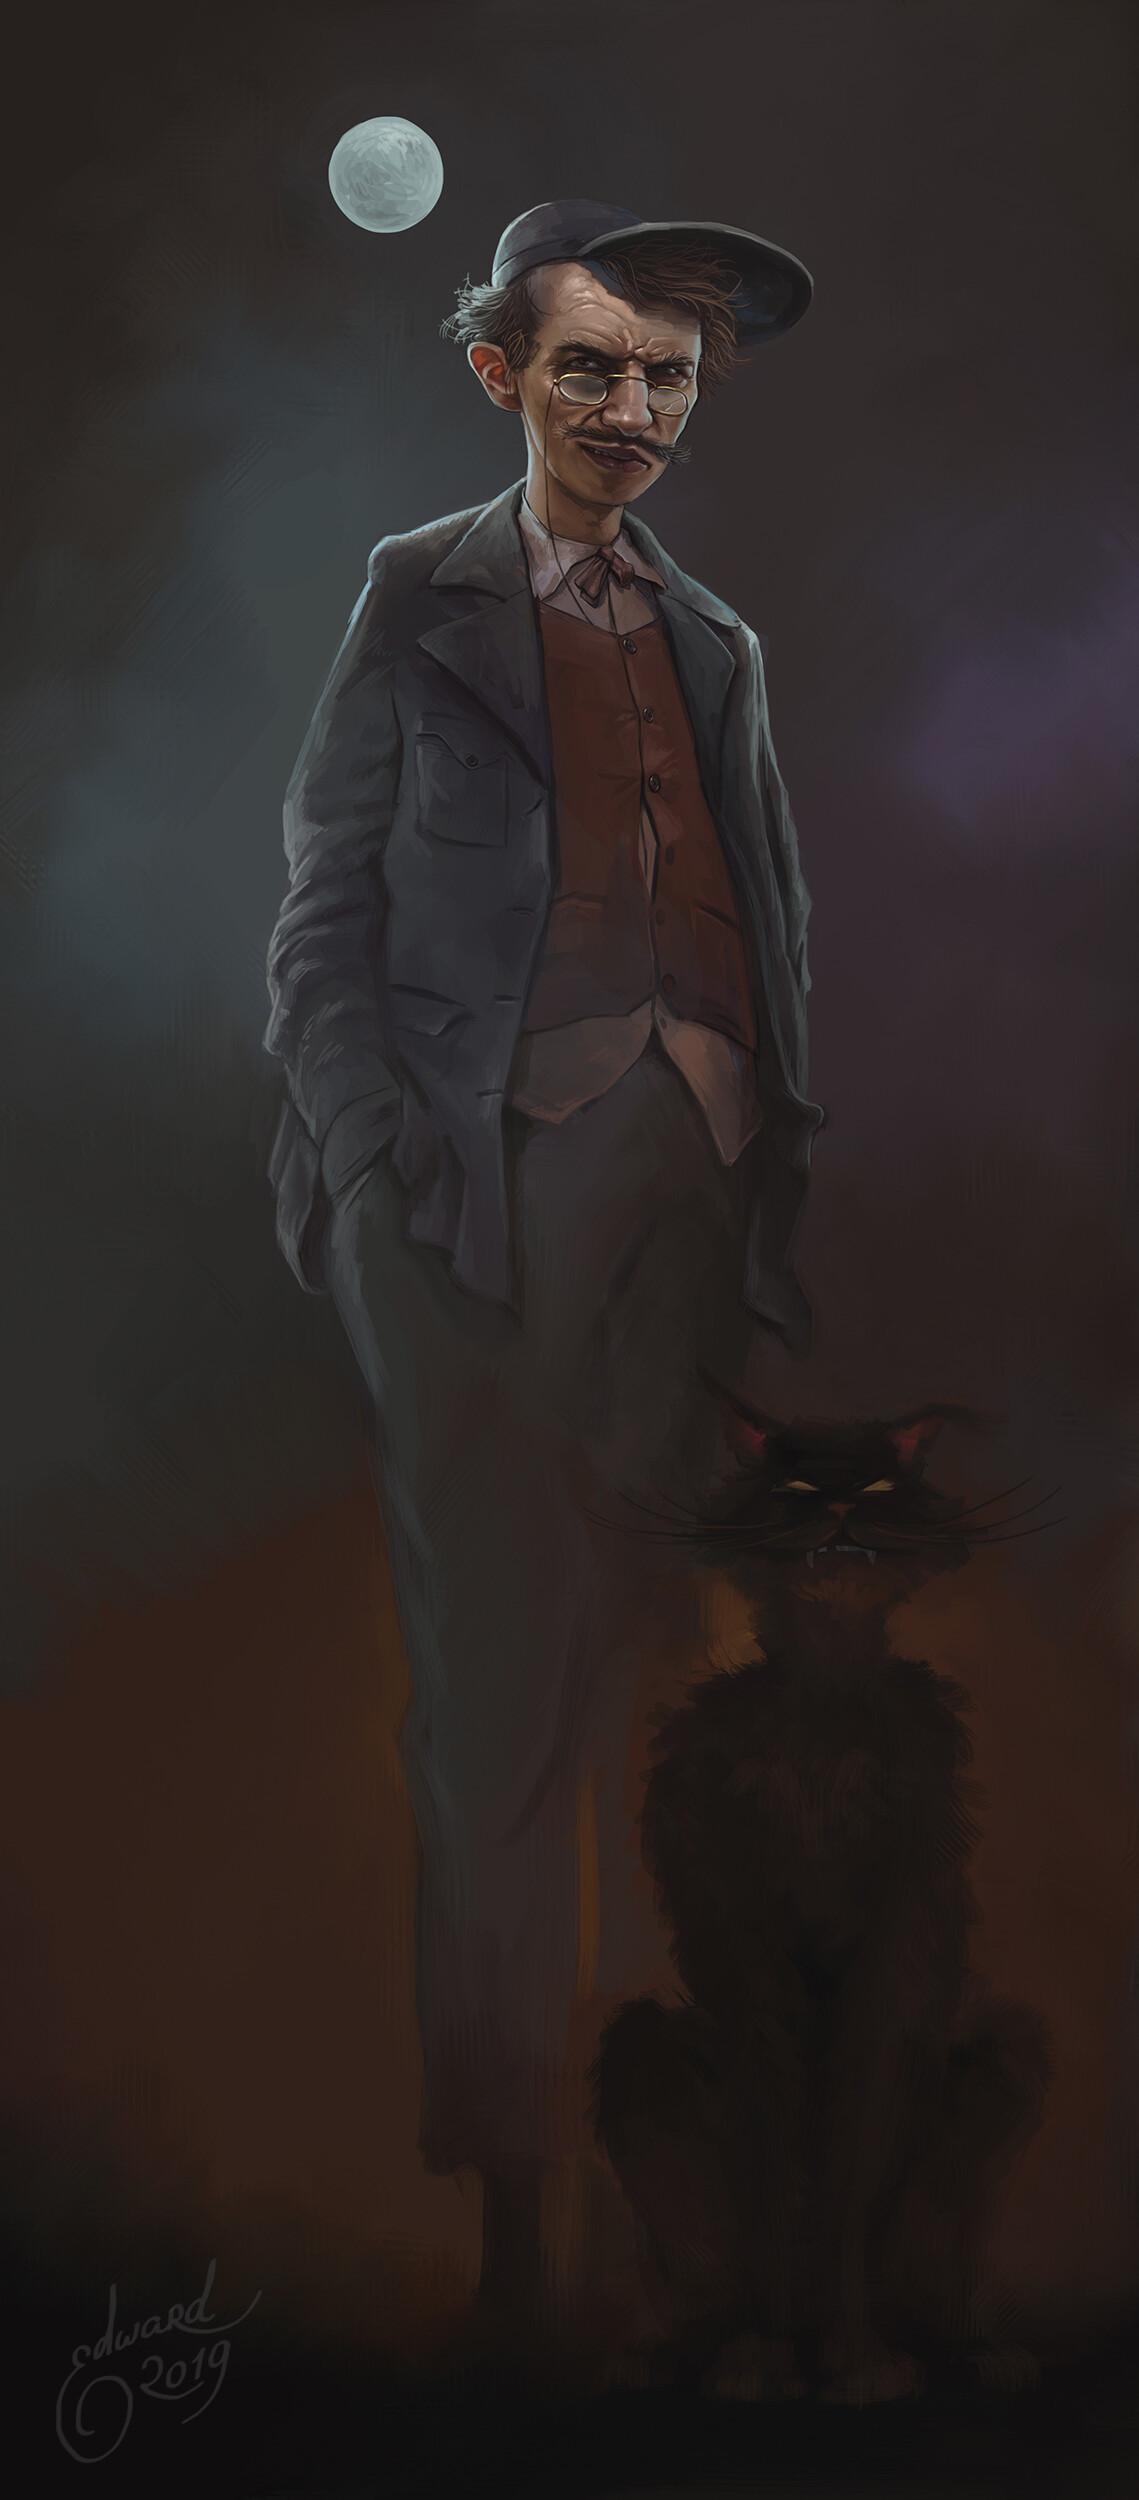 Edward halmurzaev